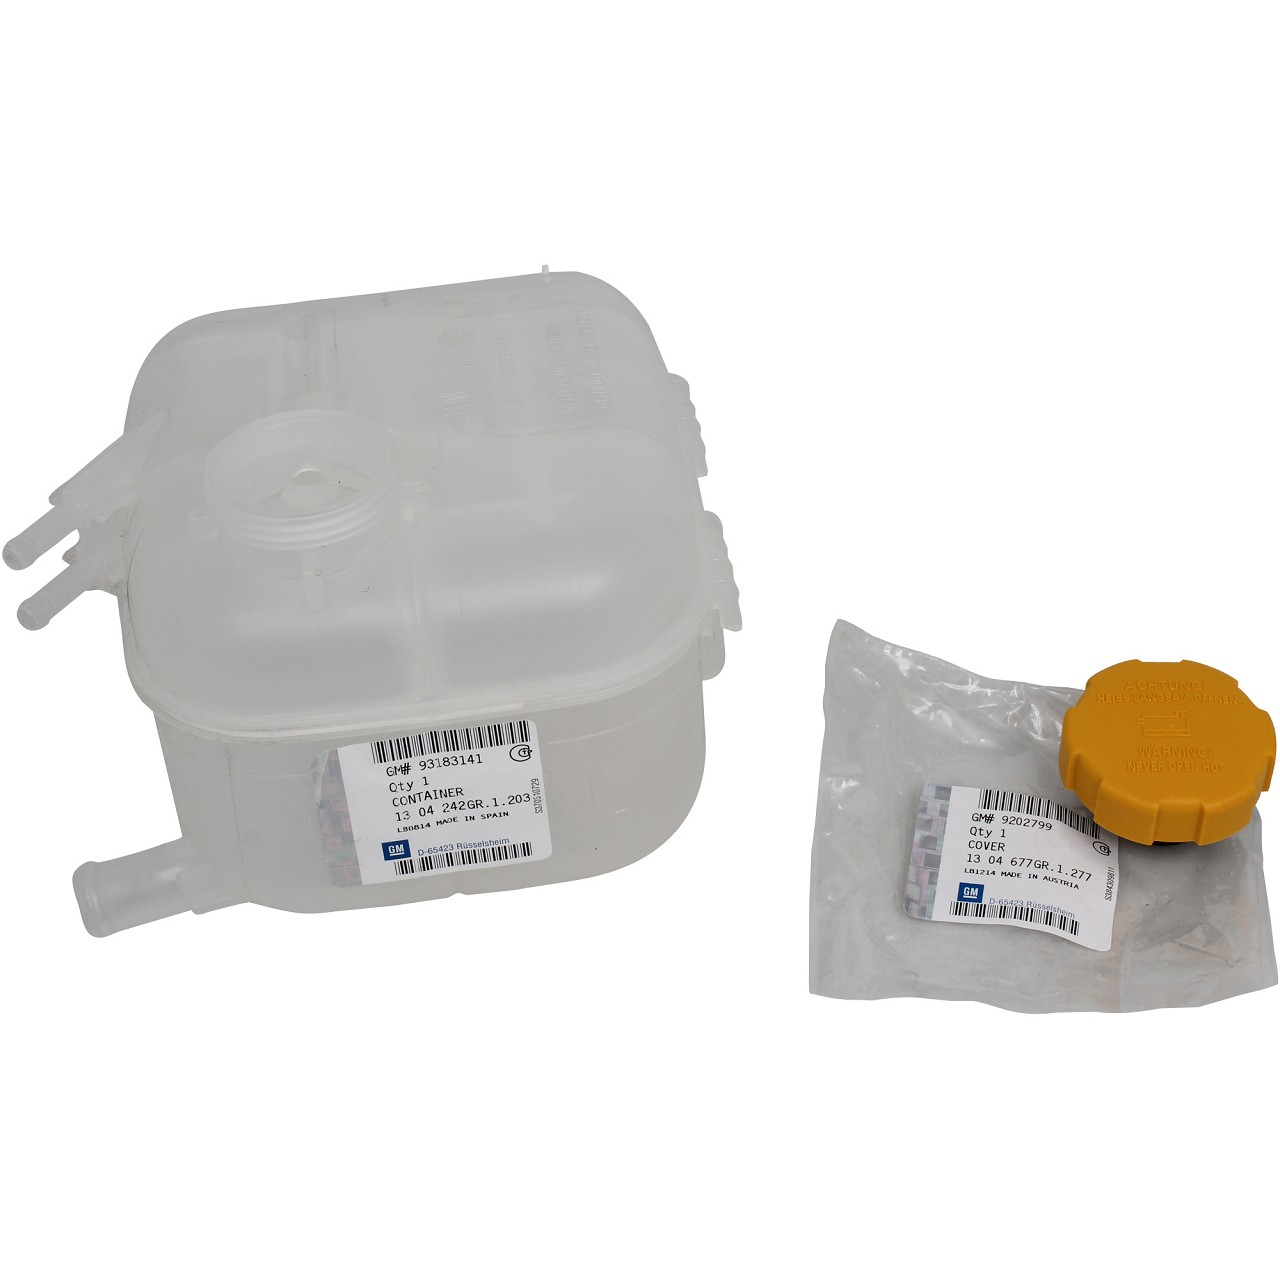 ORIGINAL GM Opel Ausgleichsbehälter Kühlmittelbehälter Zafira B 1304242+1304677